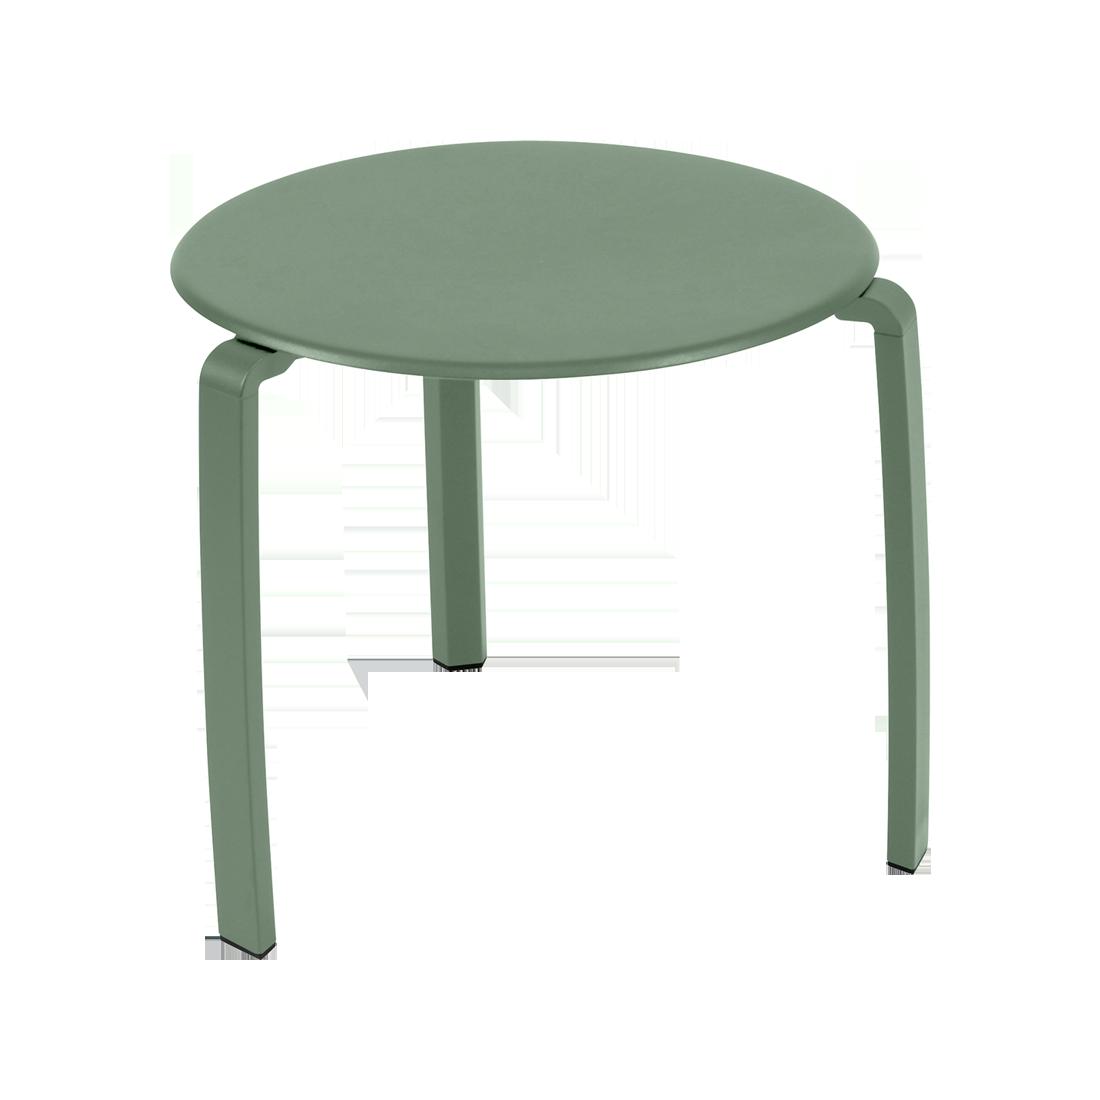 petite table basse en métal